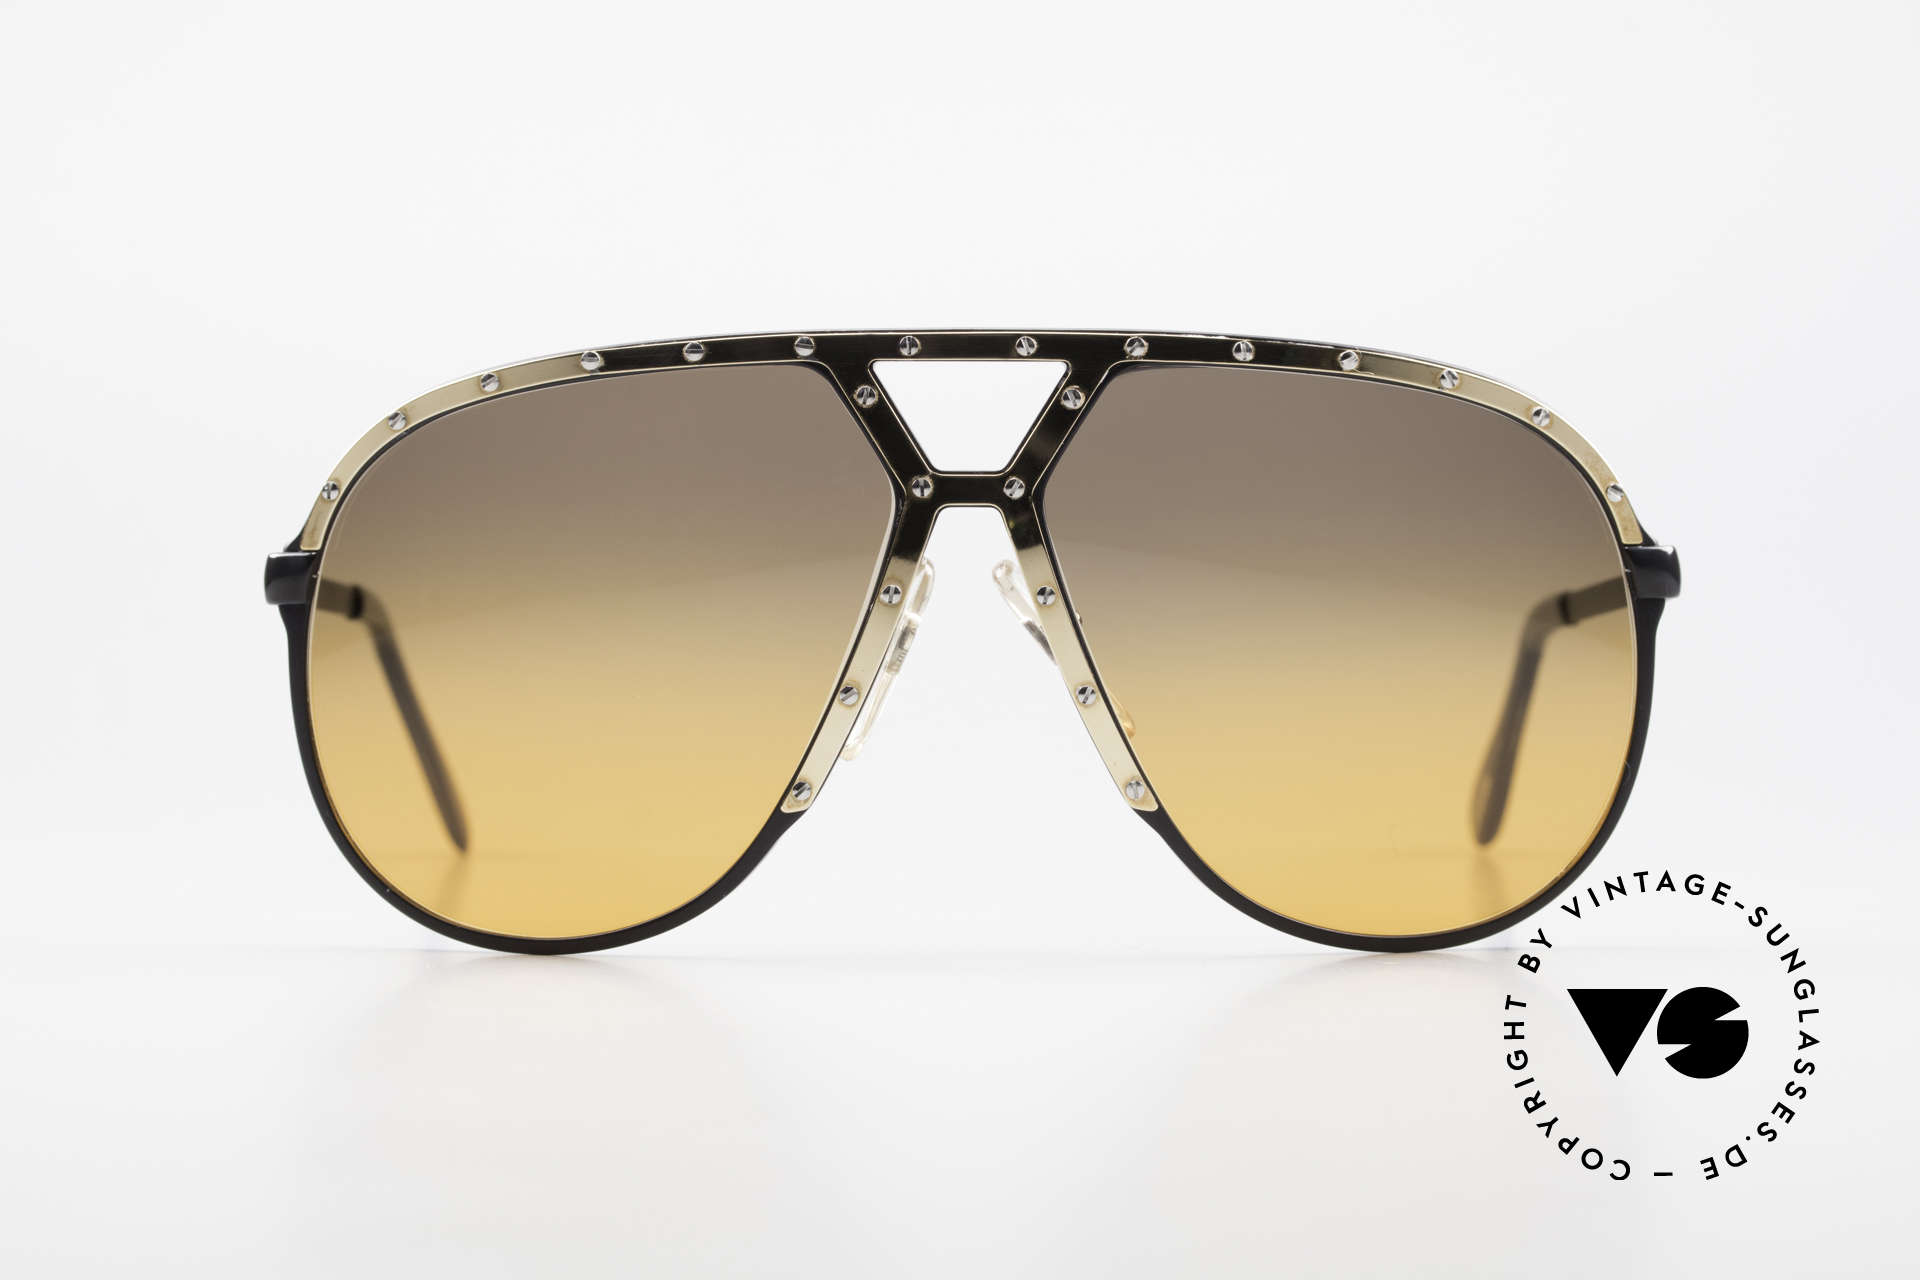 Alpina M1 80's XL Aviator Sunglasses, Stevie Wonder made the M1 model his trademark, Made for Men